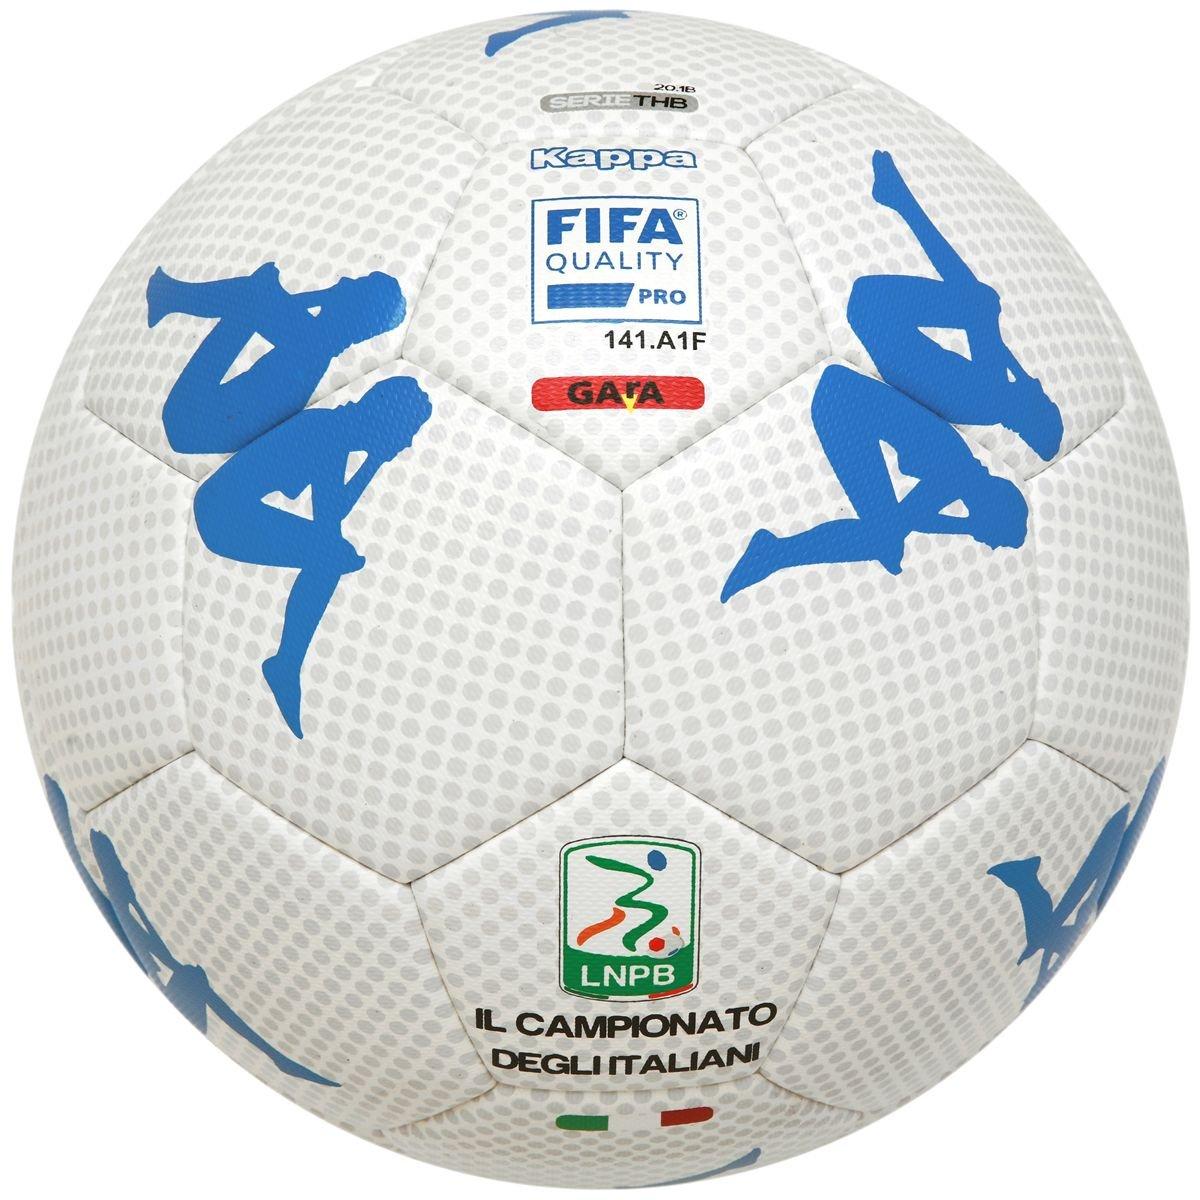 3030 x 20lnb900 Serie 20.1b THB Fa lnpb Balón Kappa: Amazon.es ...